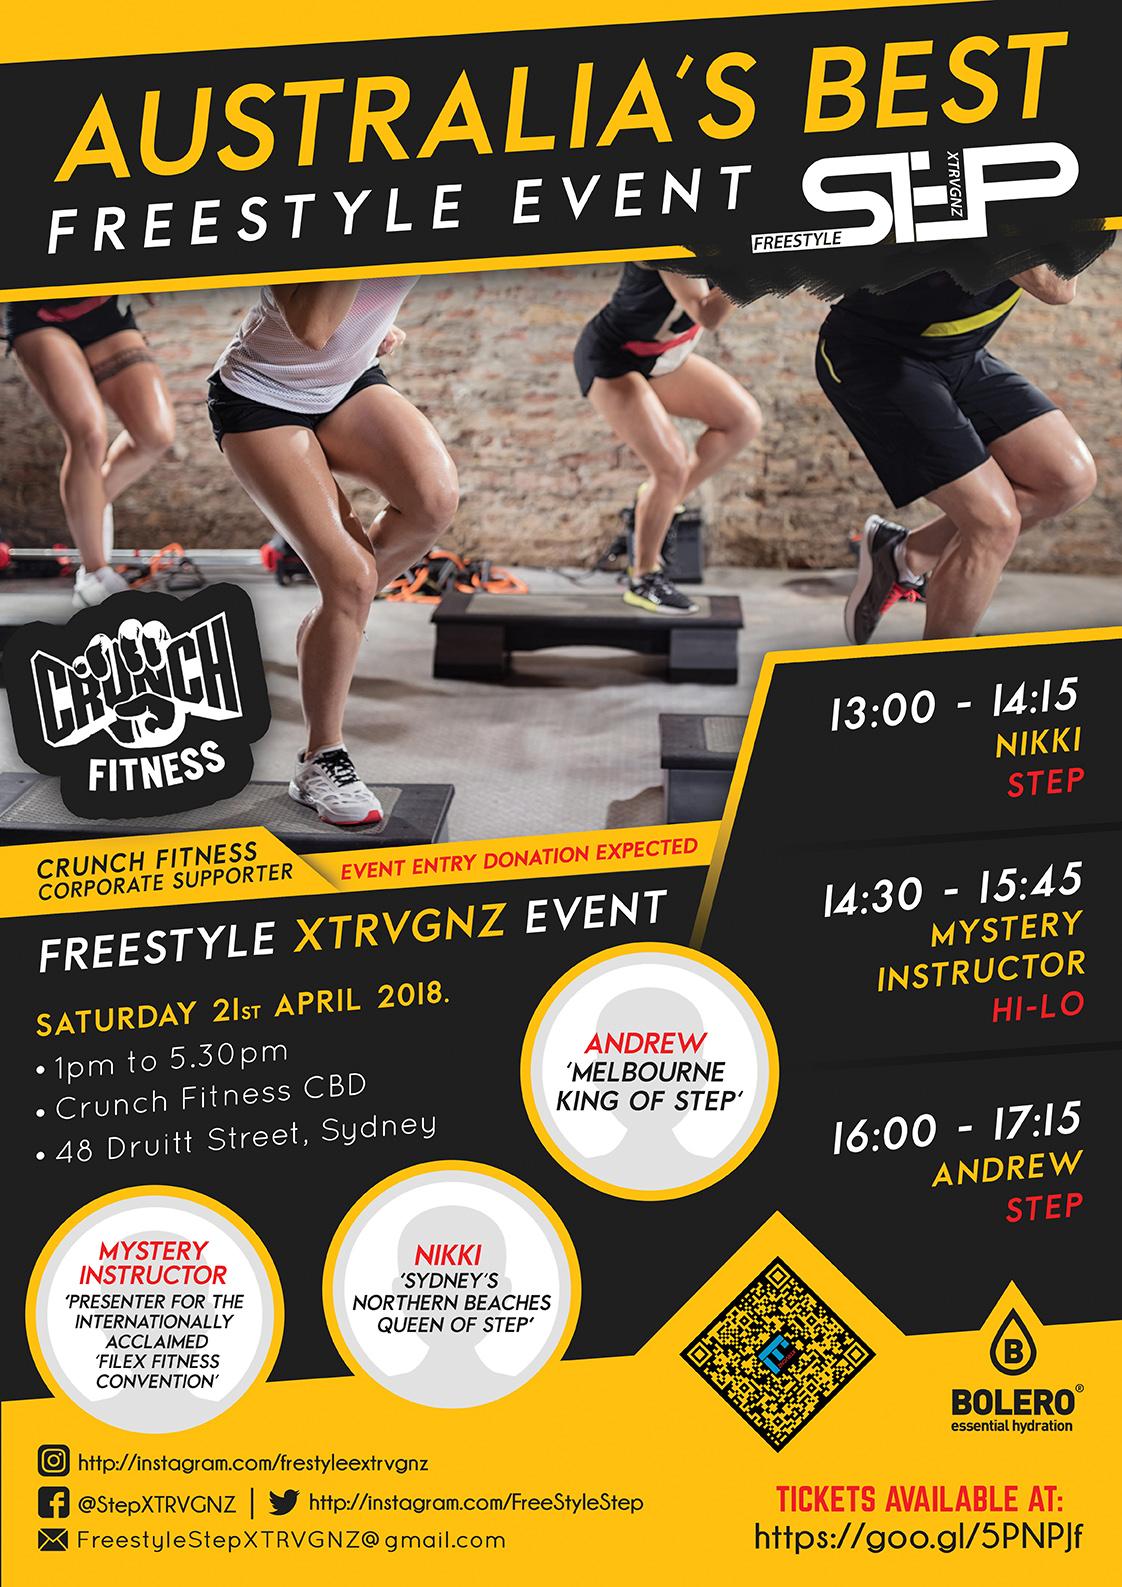 Freestyle XTRVGNZ - 21 Apr 2018